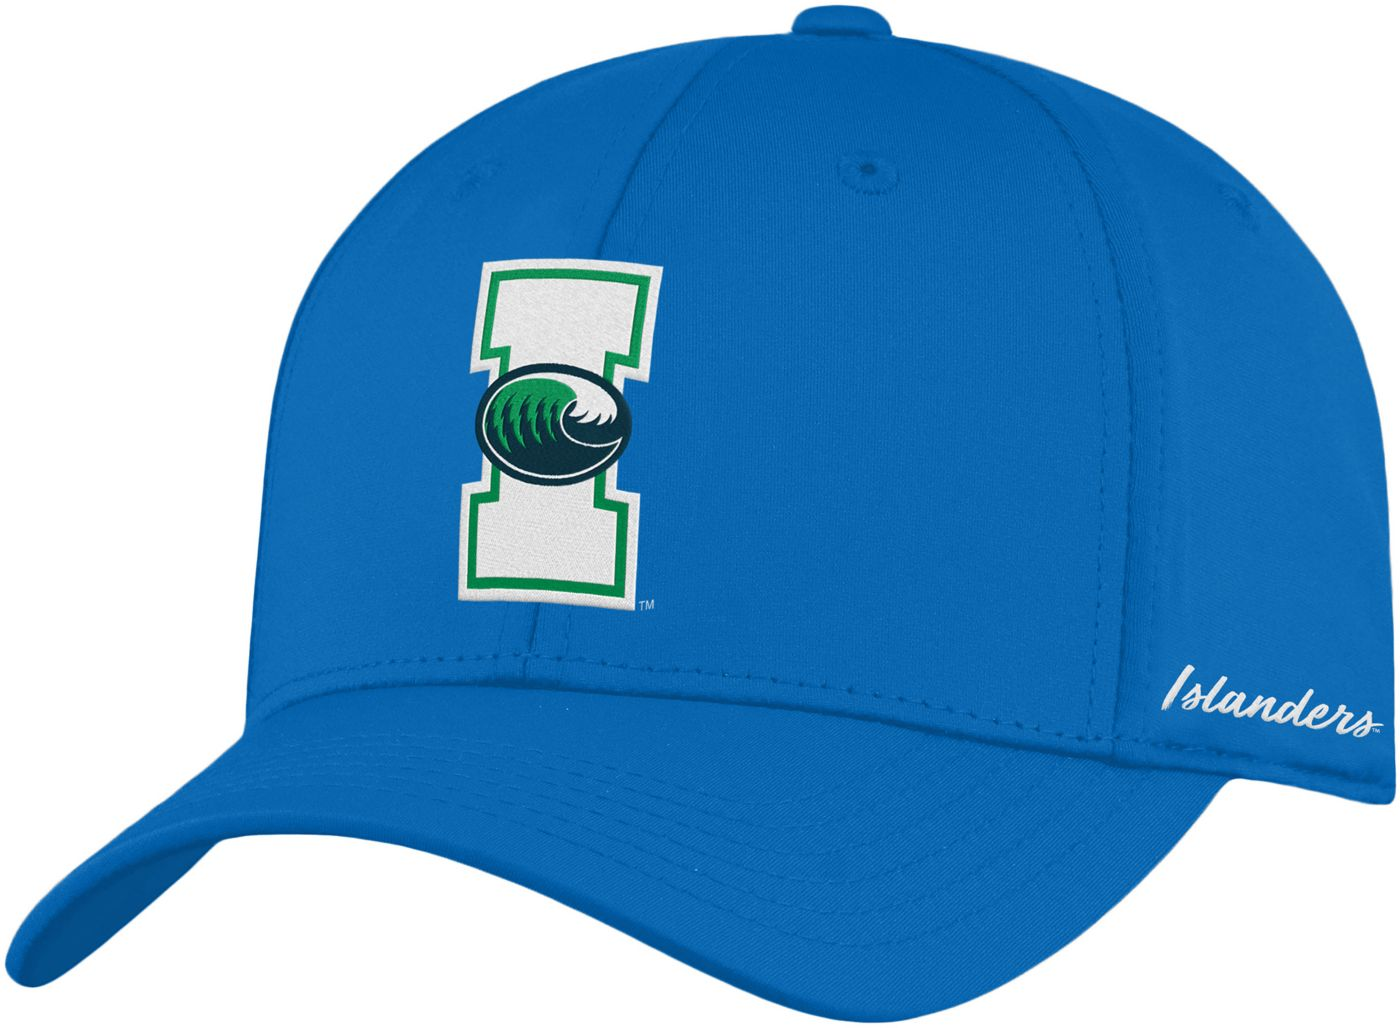 Top of the World Men's Texas A&M -Corpus Christi Islanders Blue Phenom 1Fit Flex Hat